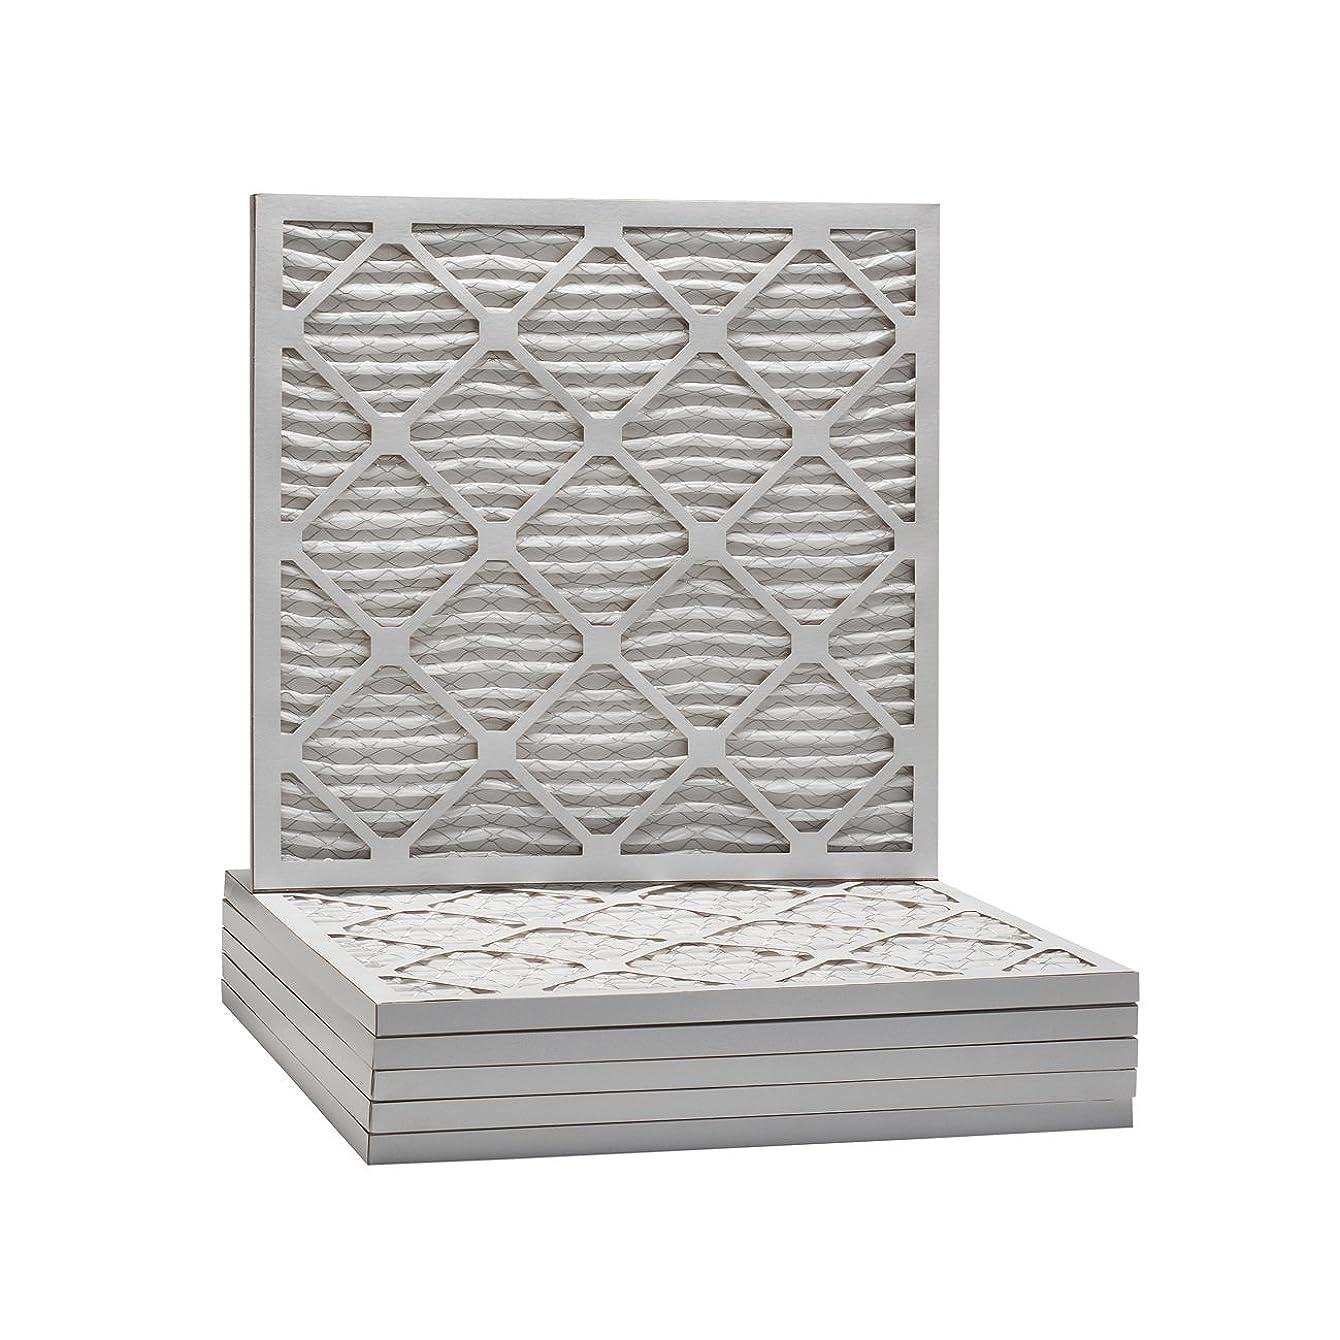 Tier1 12x12x1 Merv 8 Pleated Dust & Pollen AC Furnace Air Filter 6 Pack